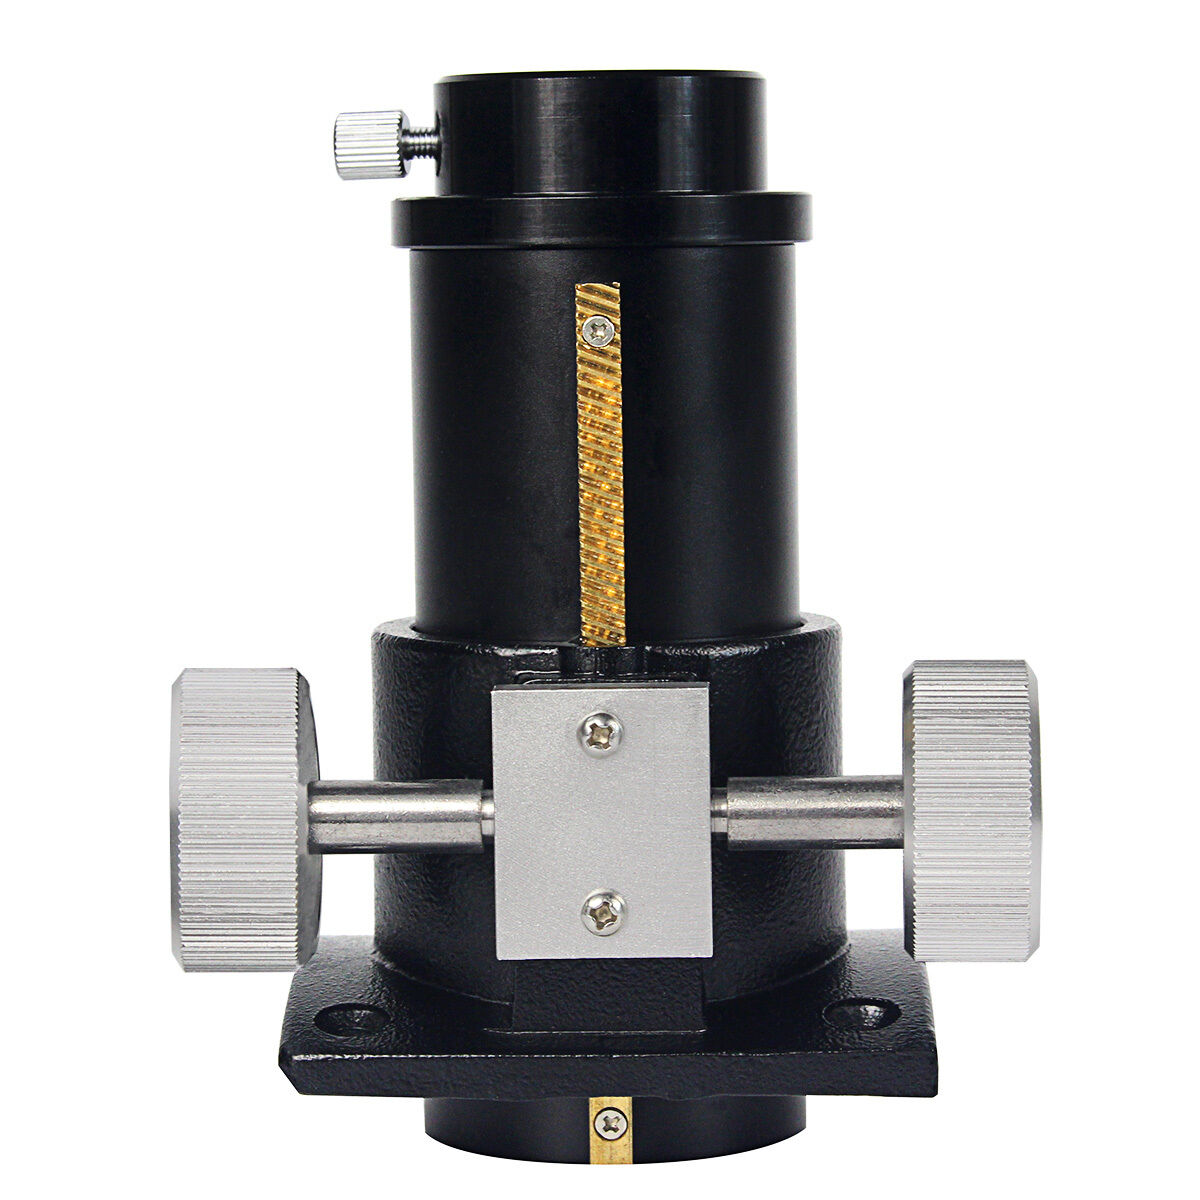 "Reflector Type 1.25""Focuser Rack Pinion for Astronomy Telesc"